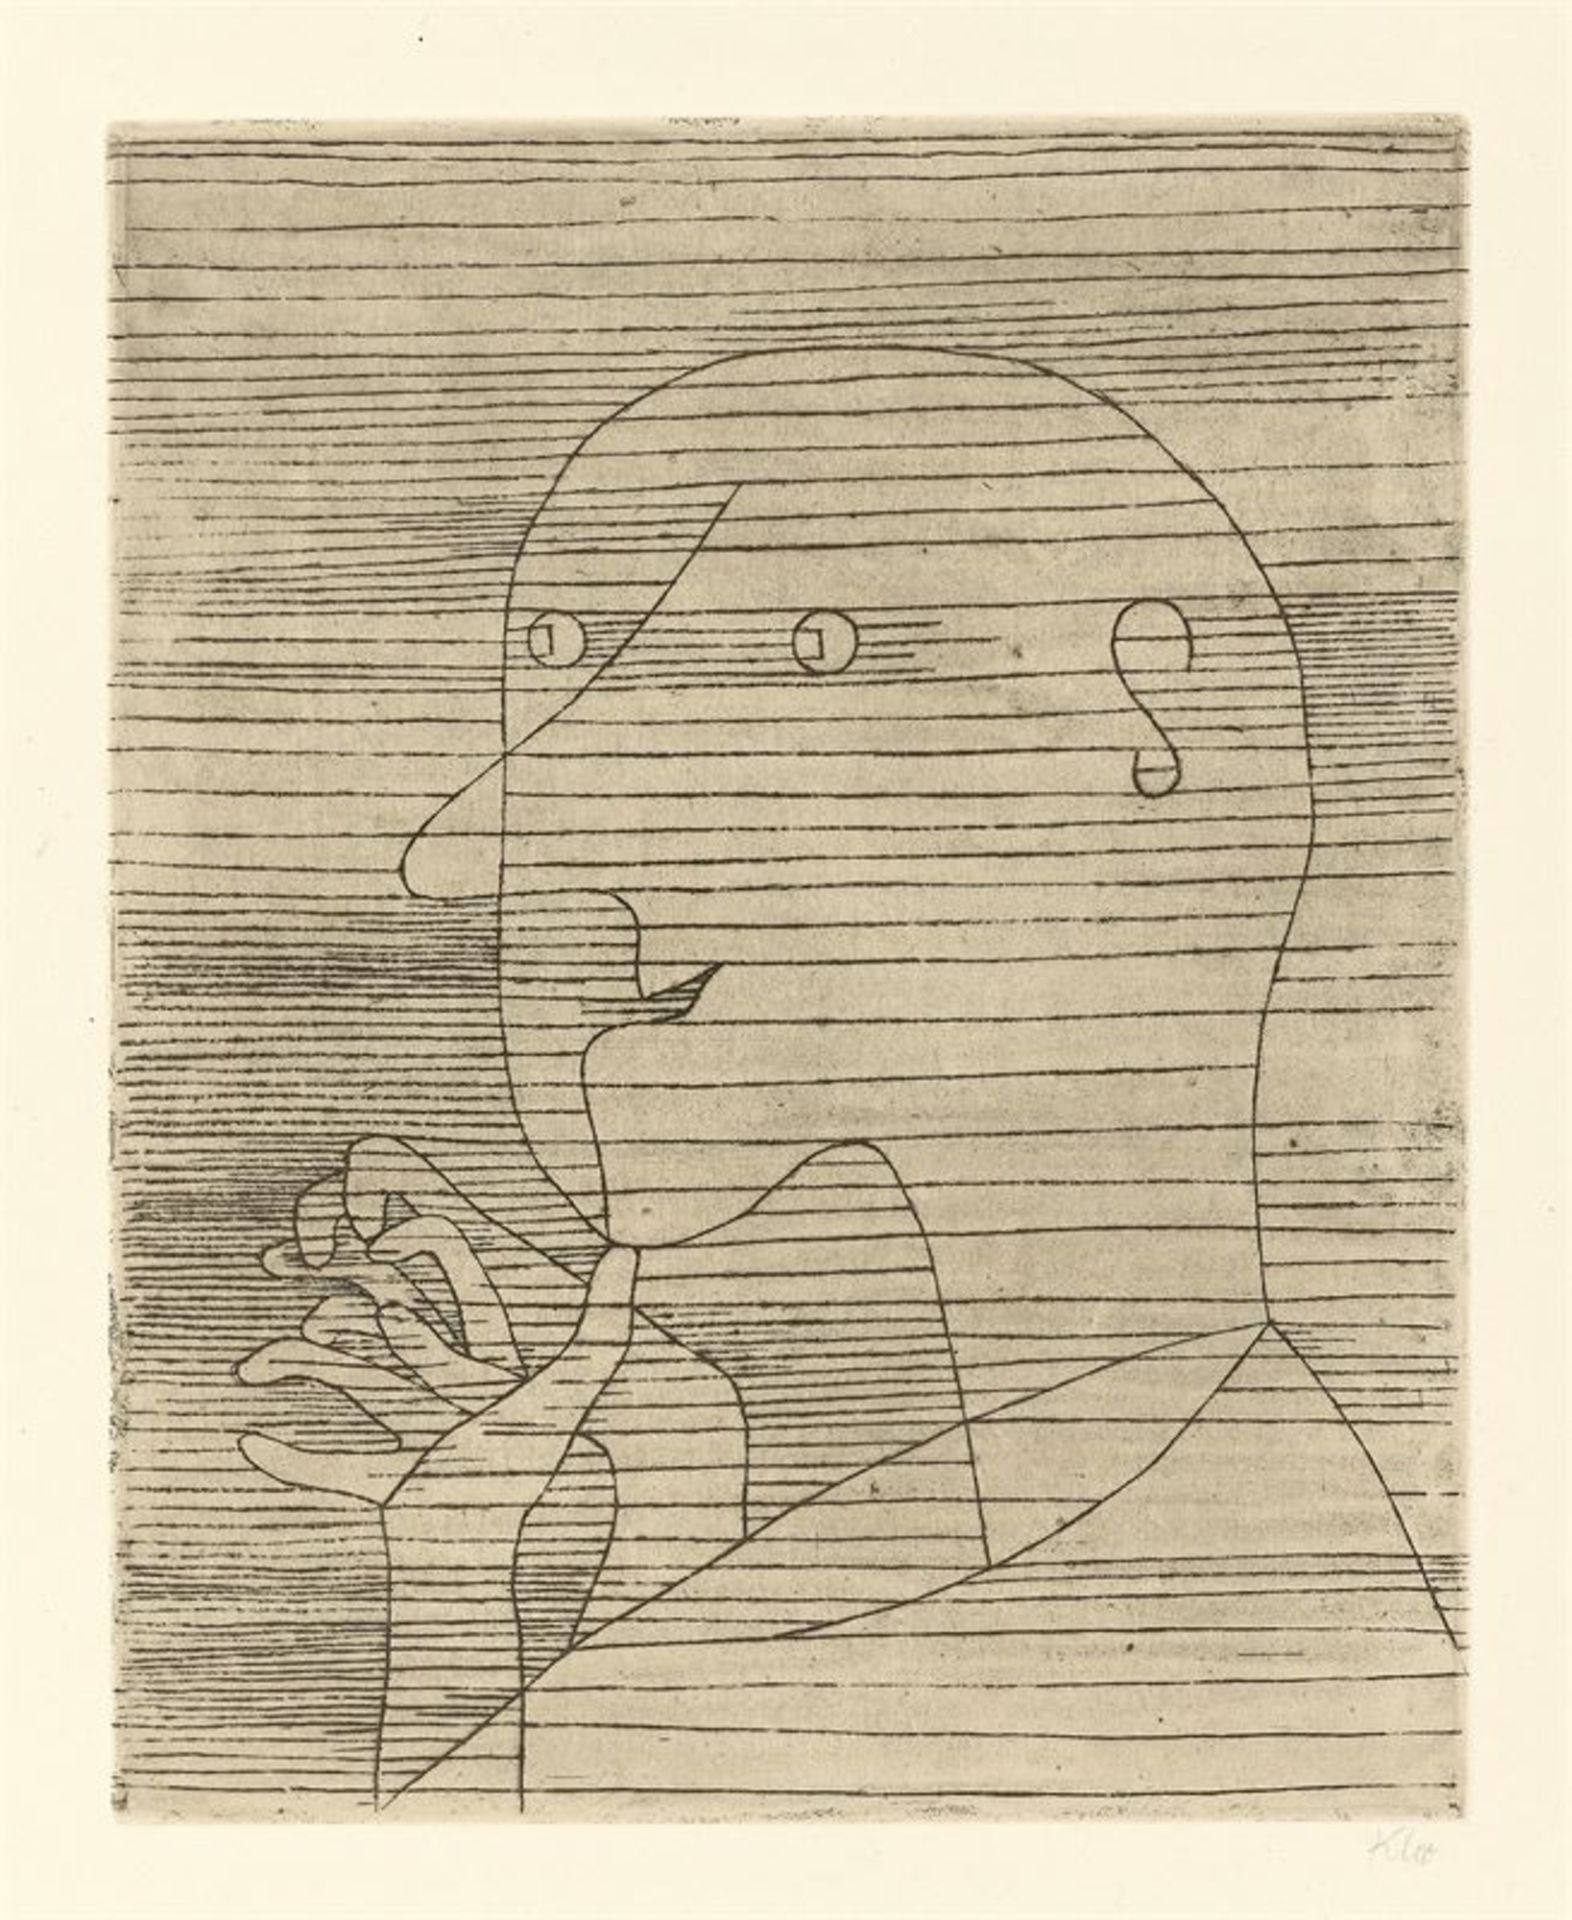 Los 197 - Paul Klee (Münchenbuchsee 1879 – 1940 Muralto bei Locarno)